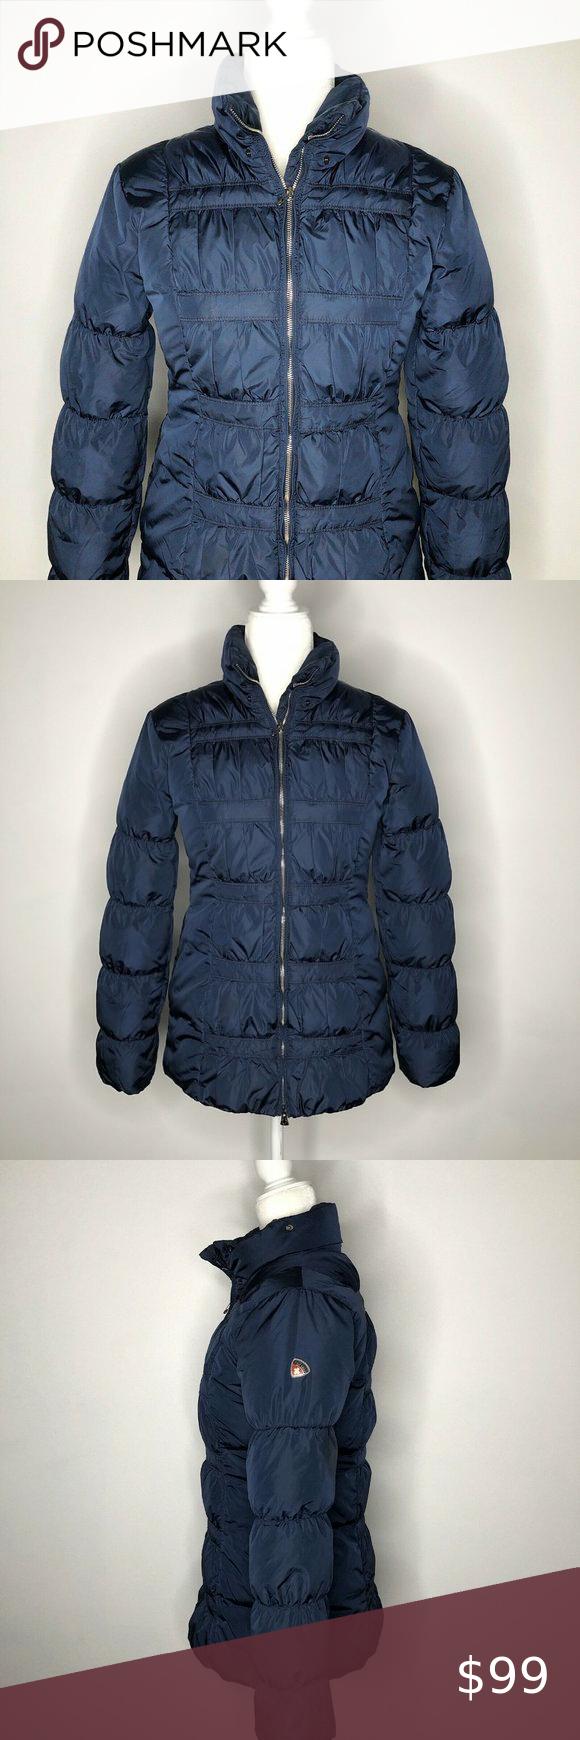 Post Card Navy Blue Pure White Down Puffer Jacket Luxury Sportswear Jackets Puffer Jackets [ 1740 x 580 Pixel ]